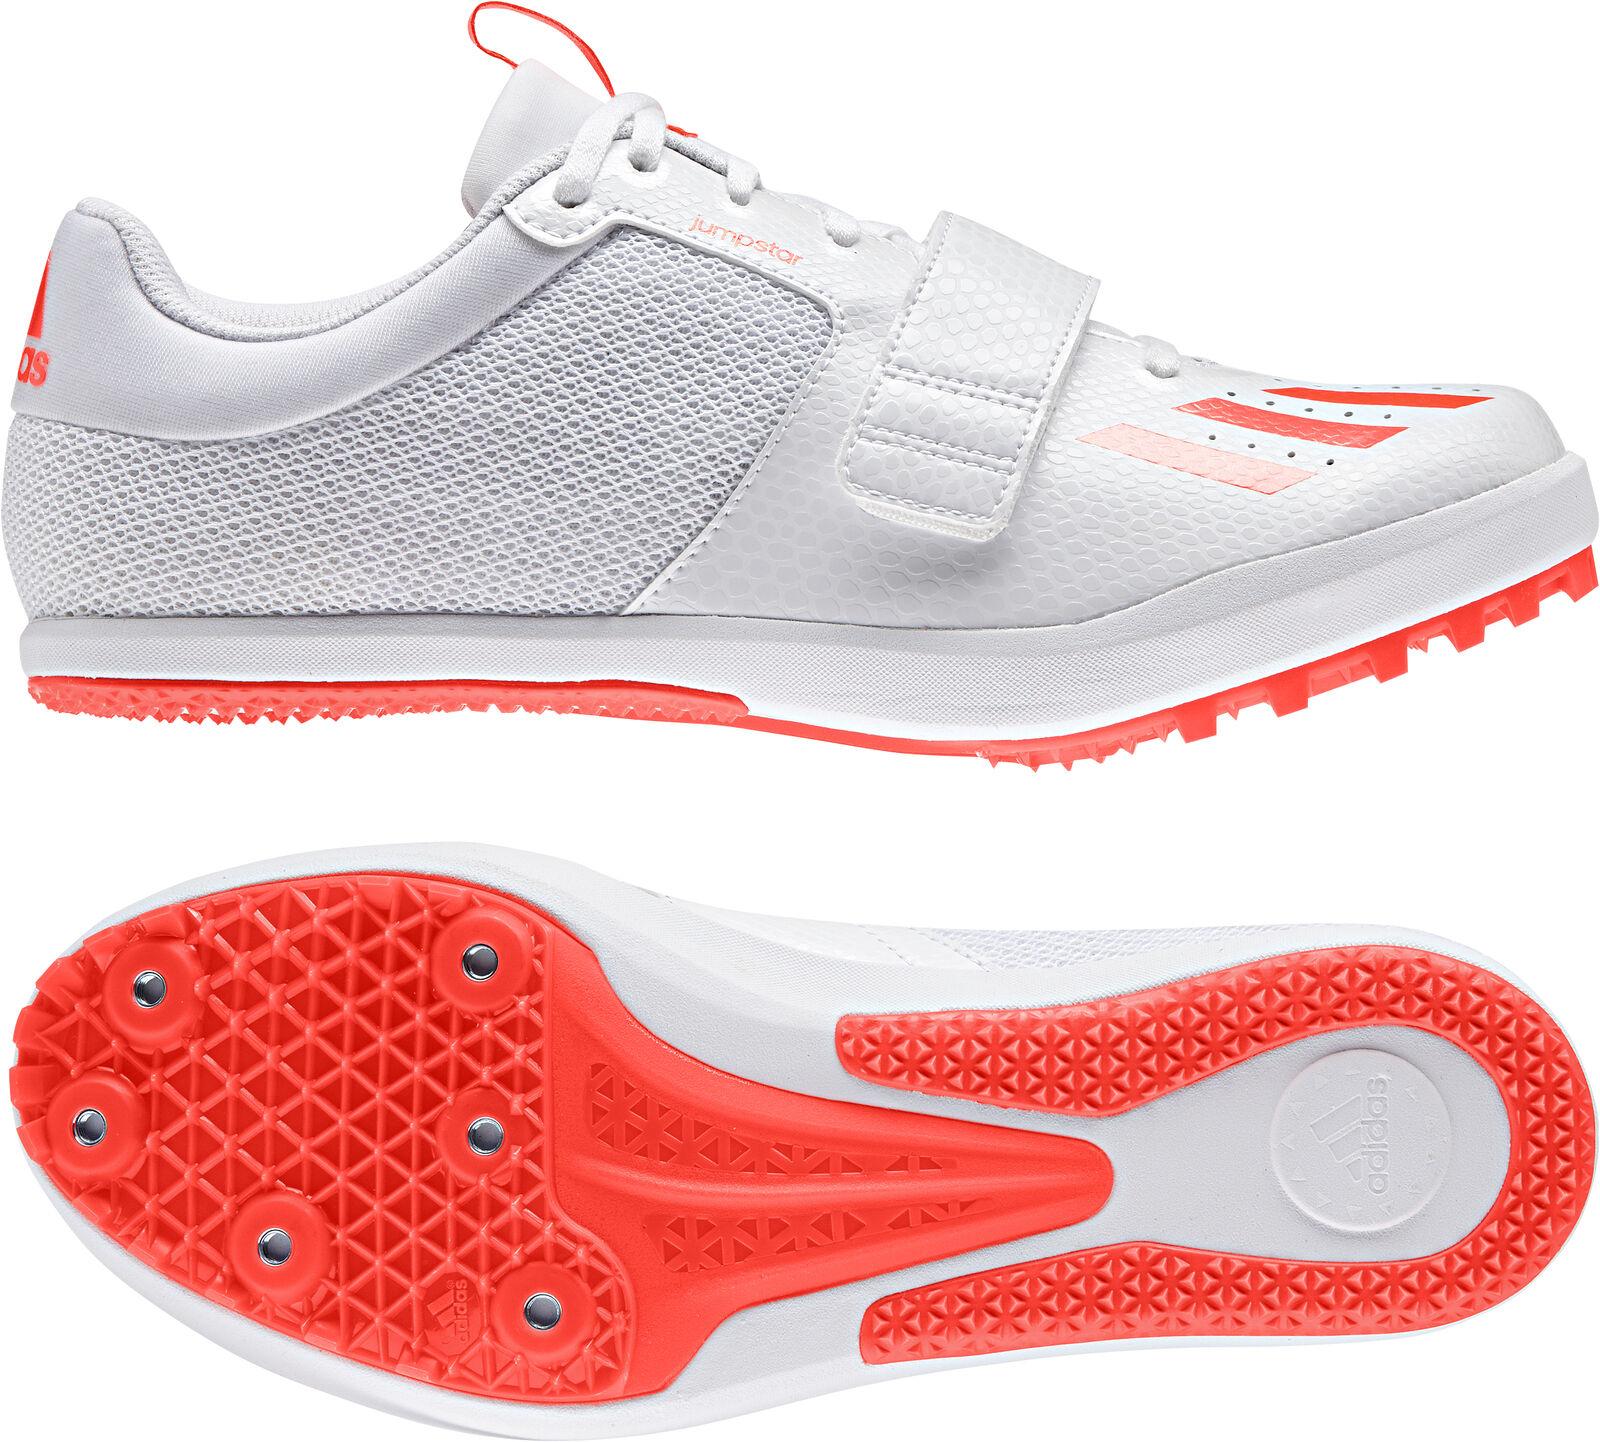 Adidas jumpEstrella Allround Field  event spikes-blanco  más descuento